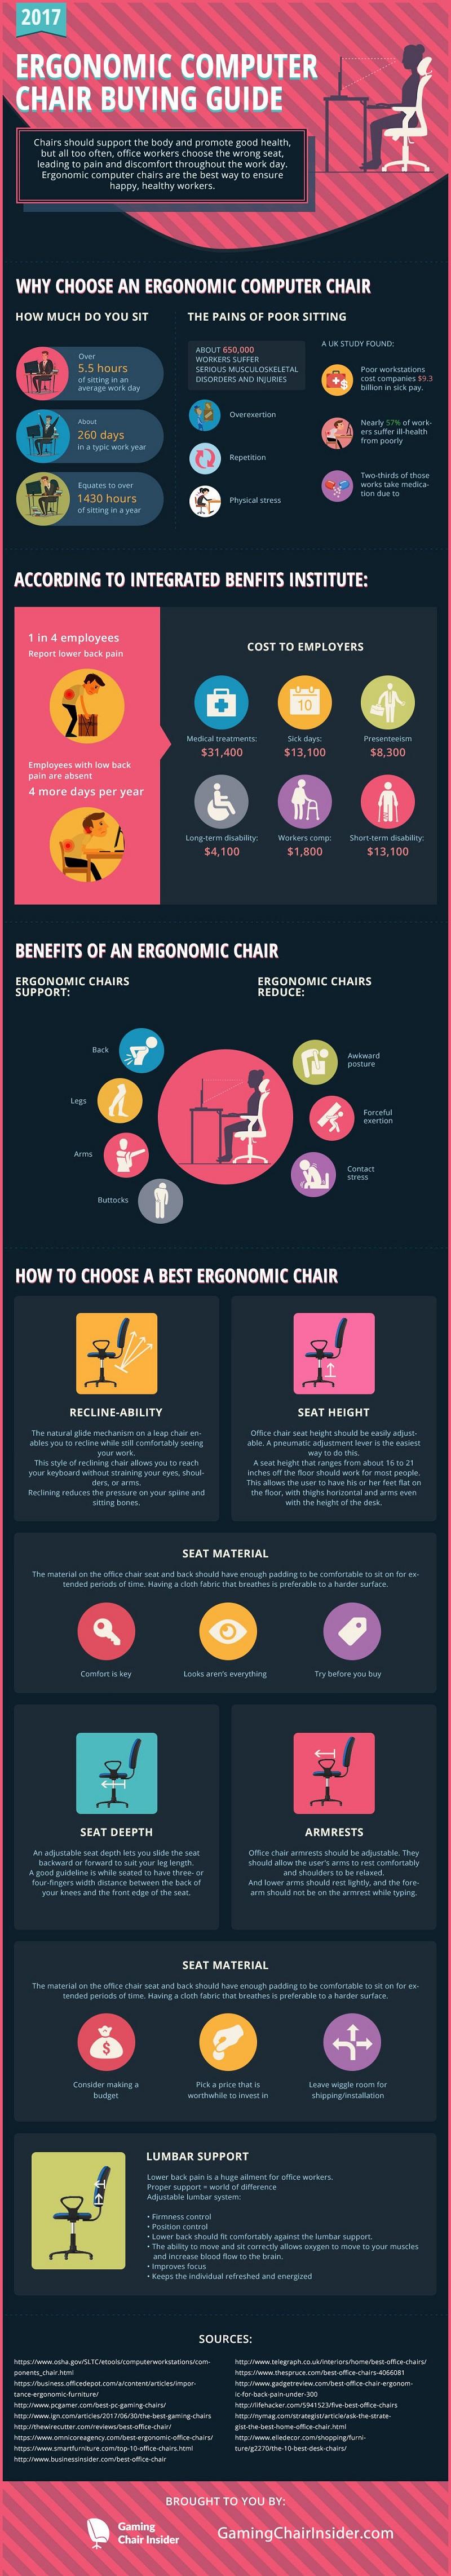 Ergonomic Computer Chair Buying Guide